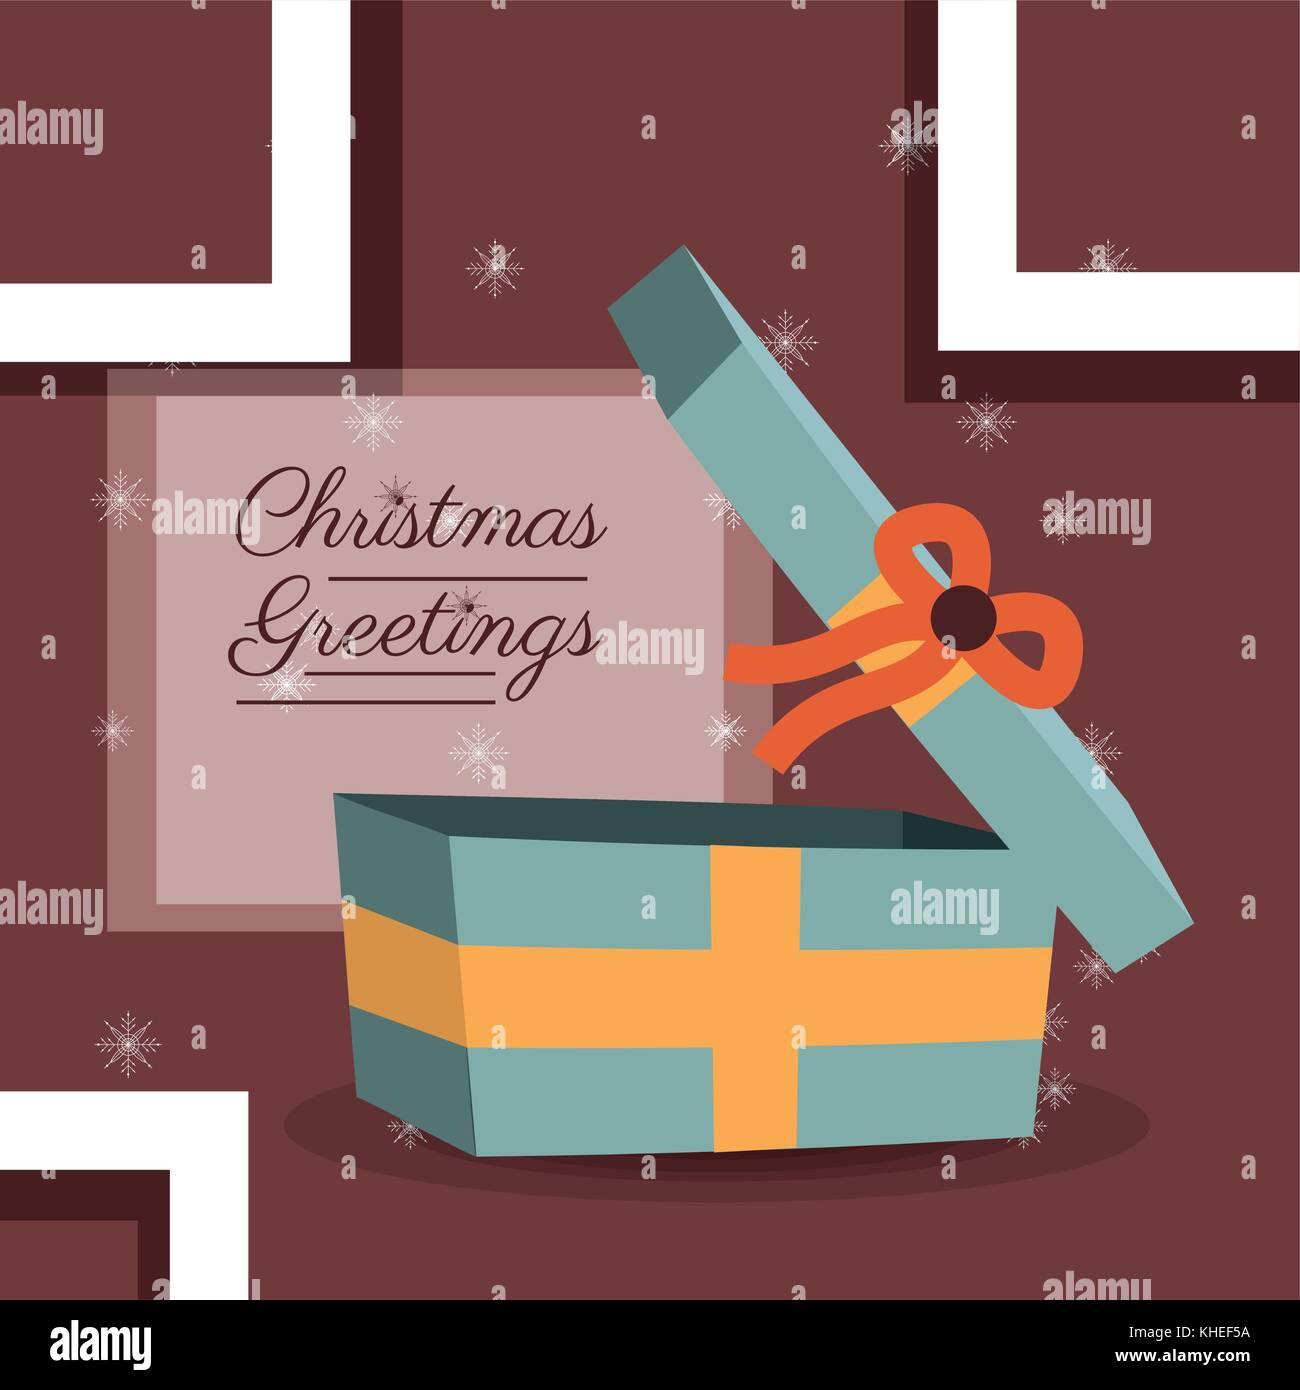 Christmas Greetings Vintage Christmas Card Stock Vector Images Alamy